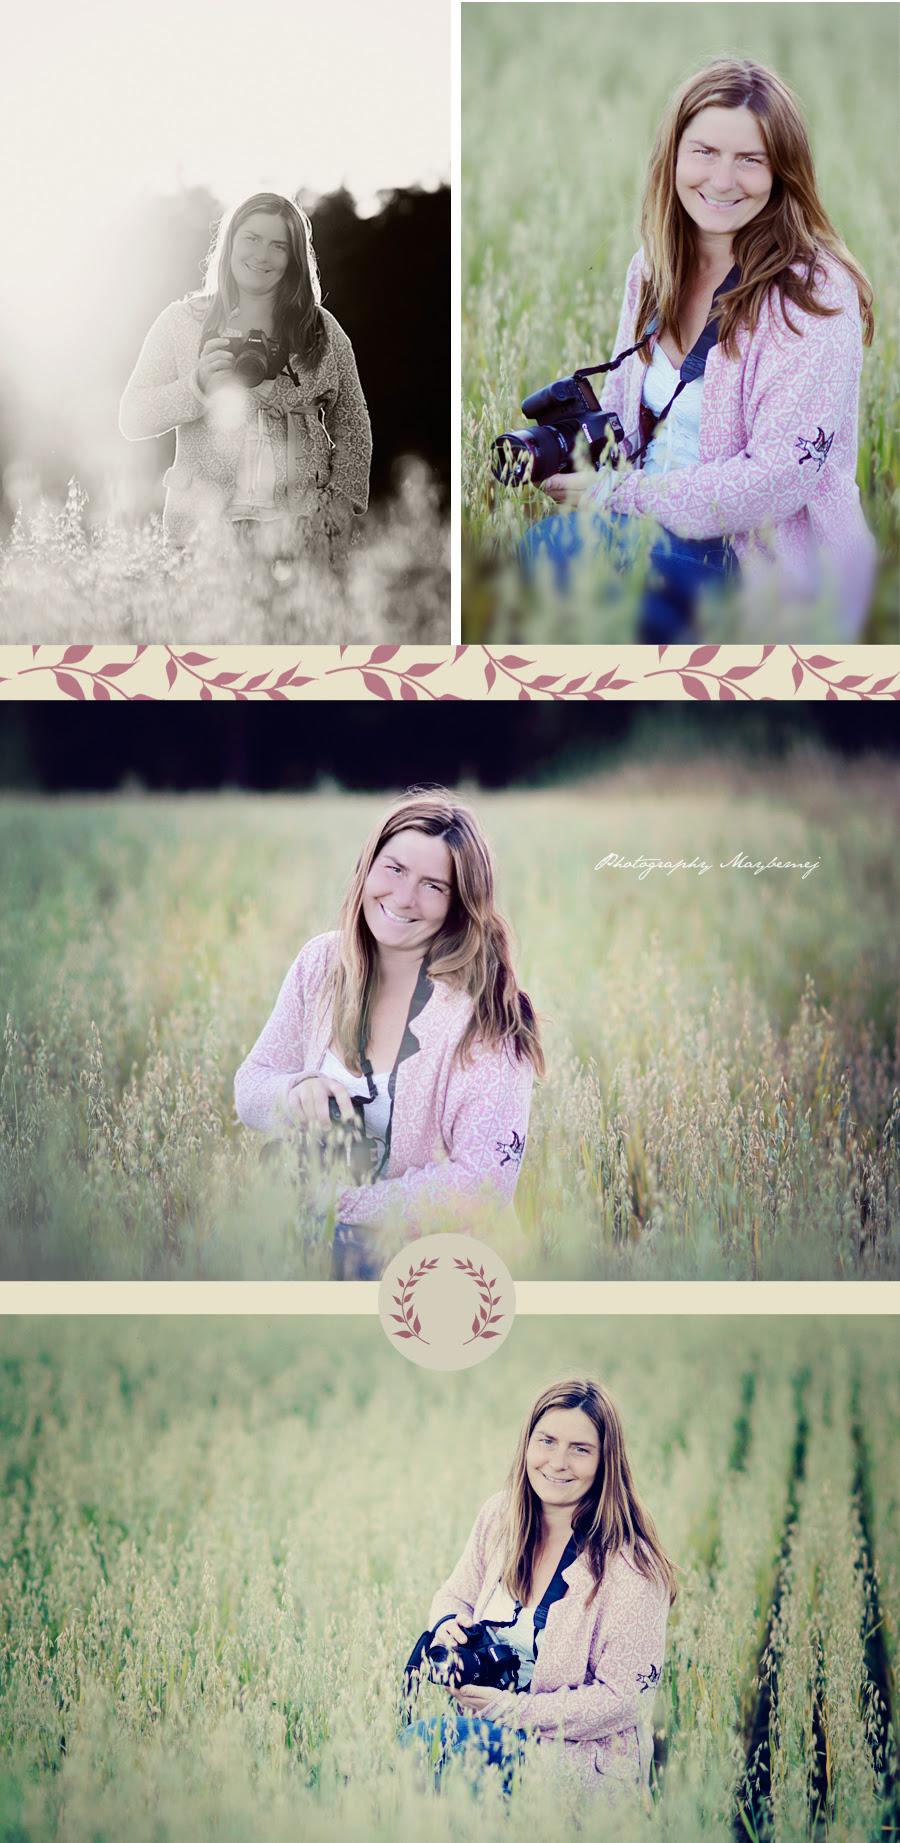 7-collage-linda